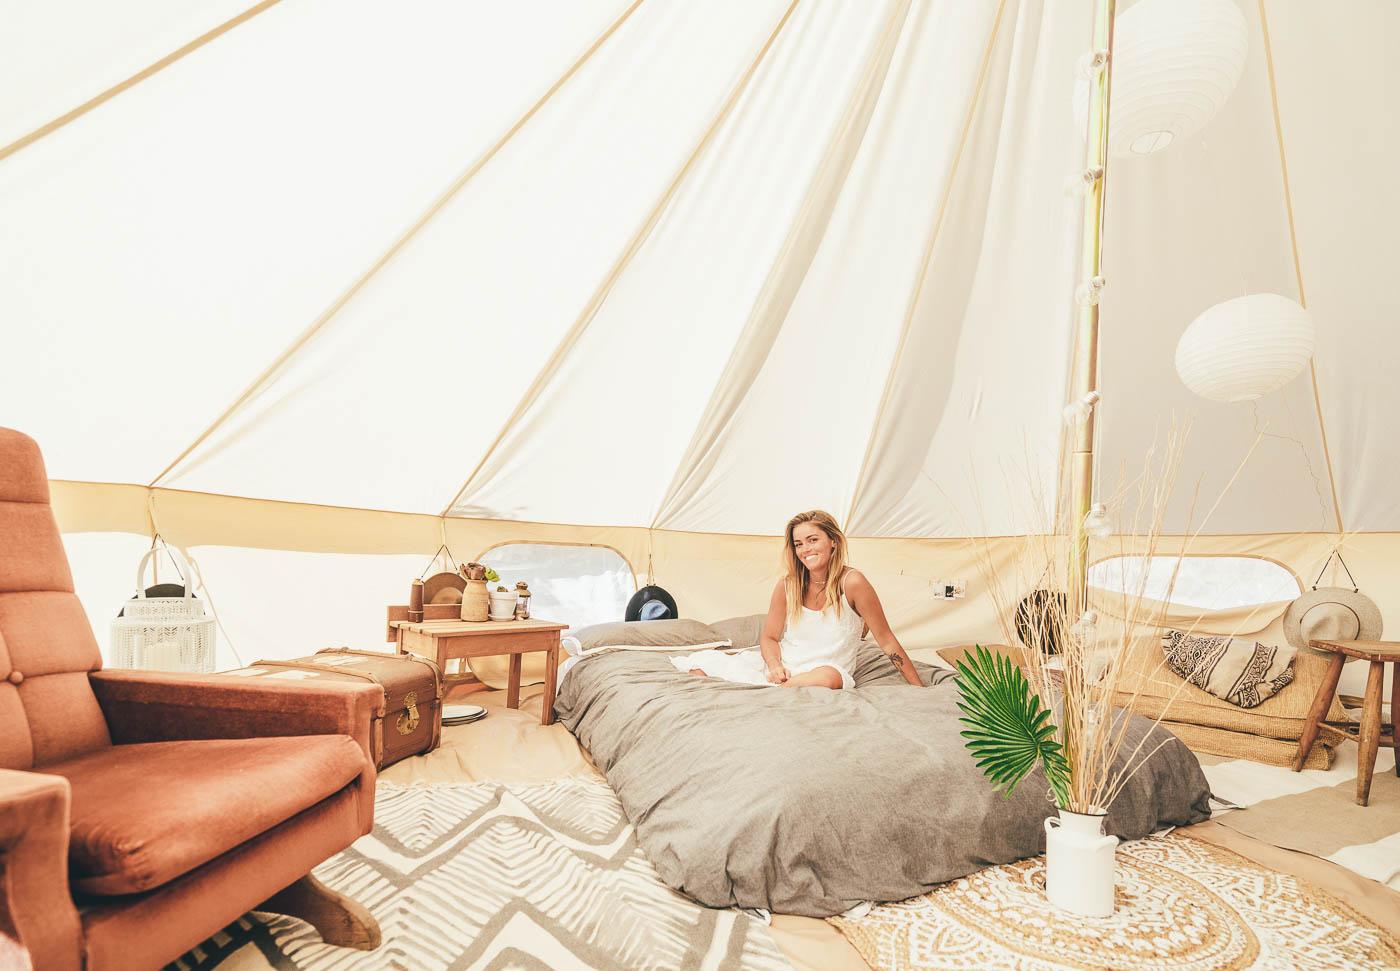 Jess Davis in a Bell Tent in New Zealand